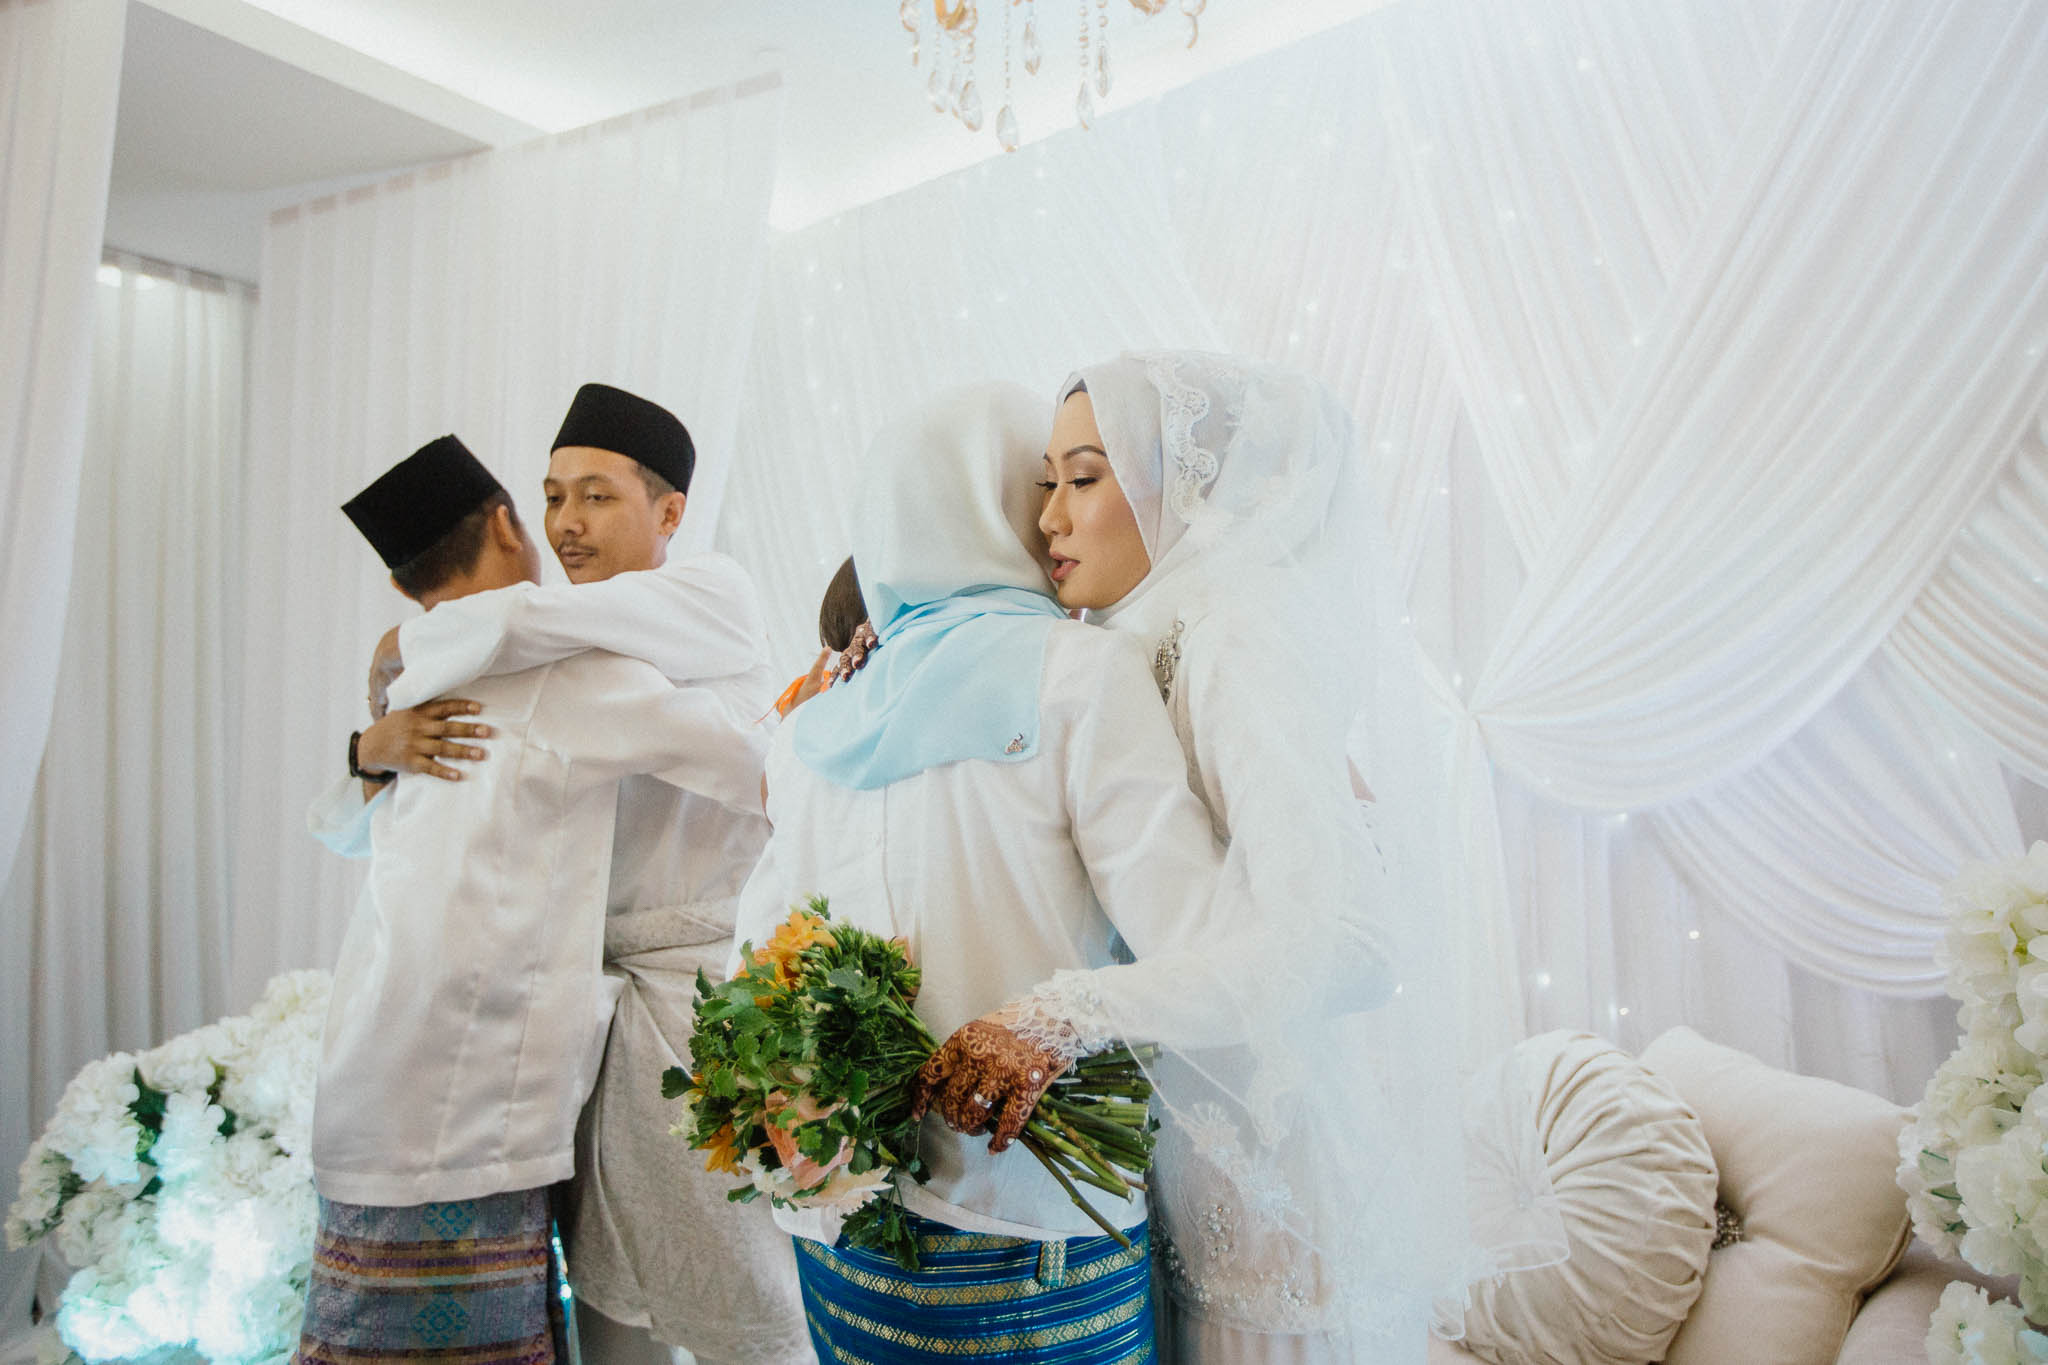 singapore-wedding-photographer-addafiq-nufail-029.jpg